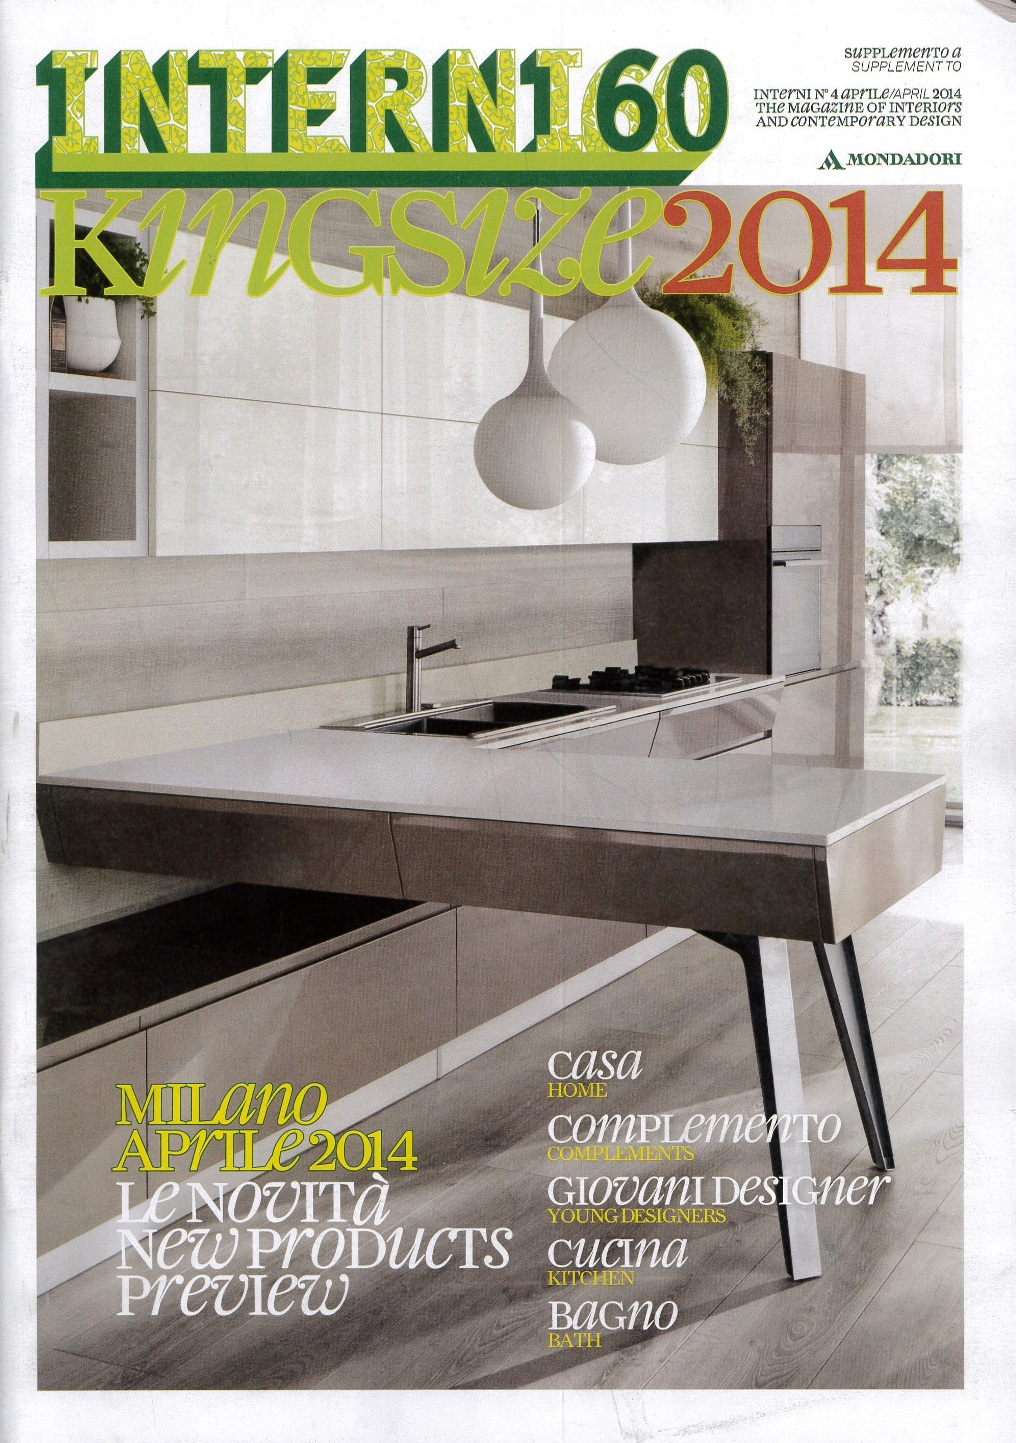 dedece interni young designers salone 2014 (13)